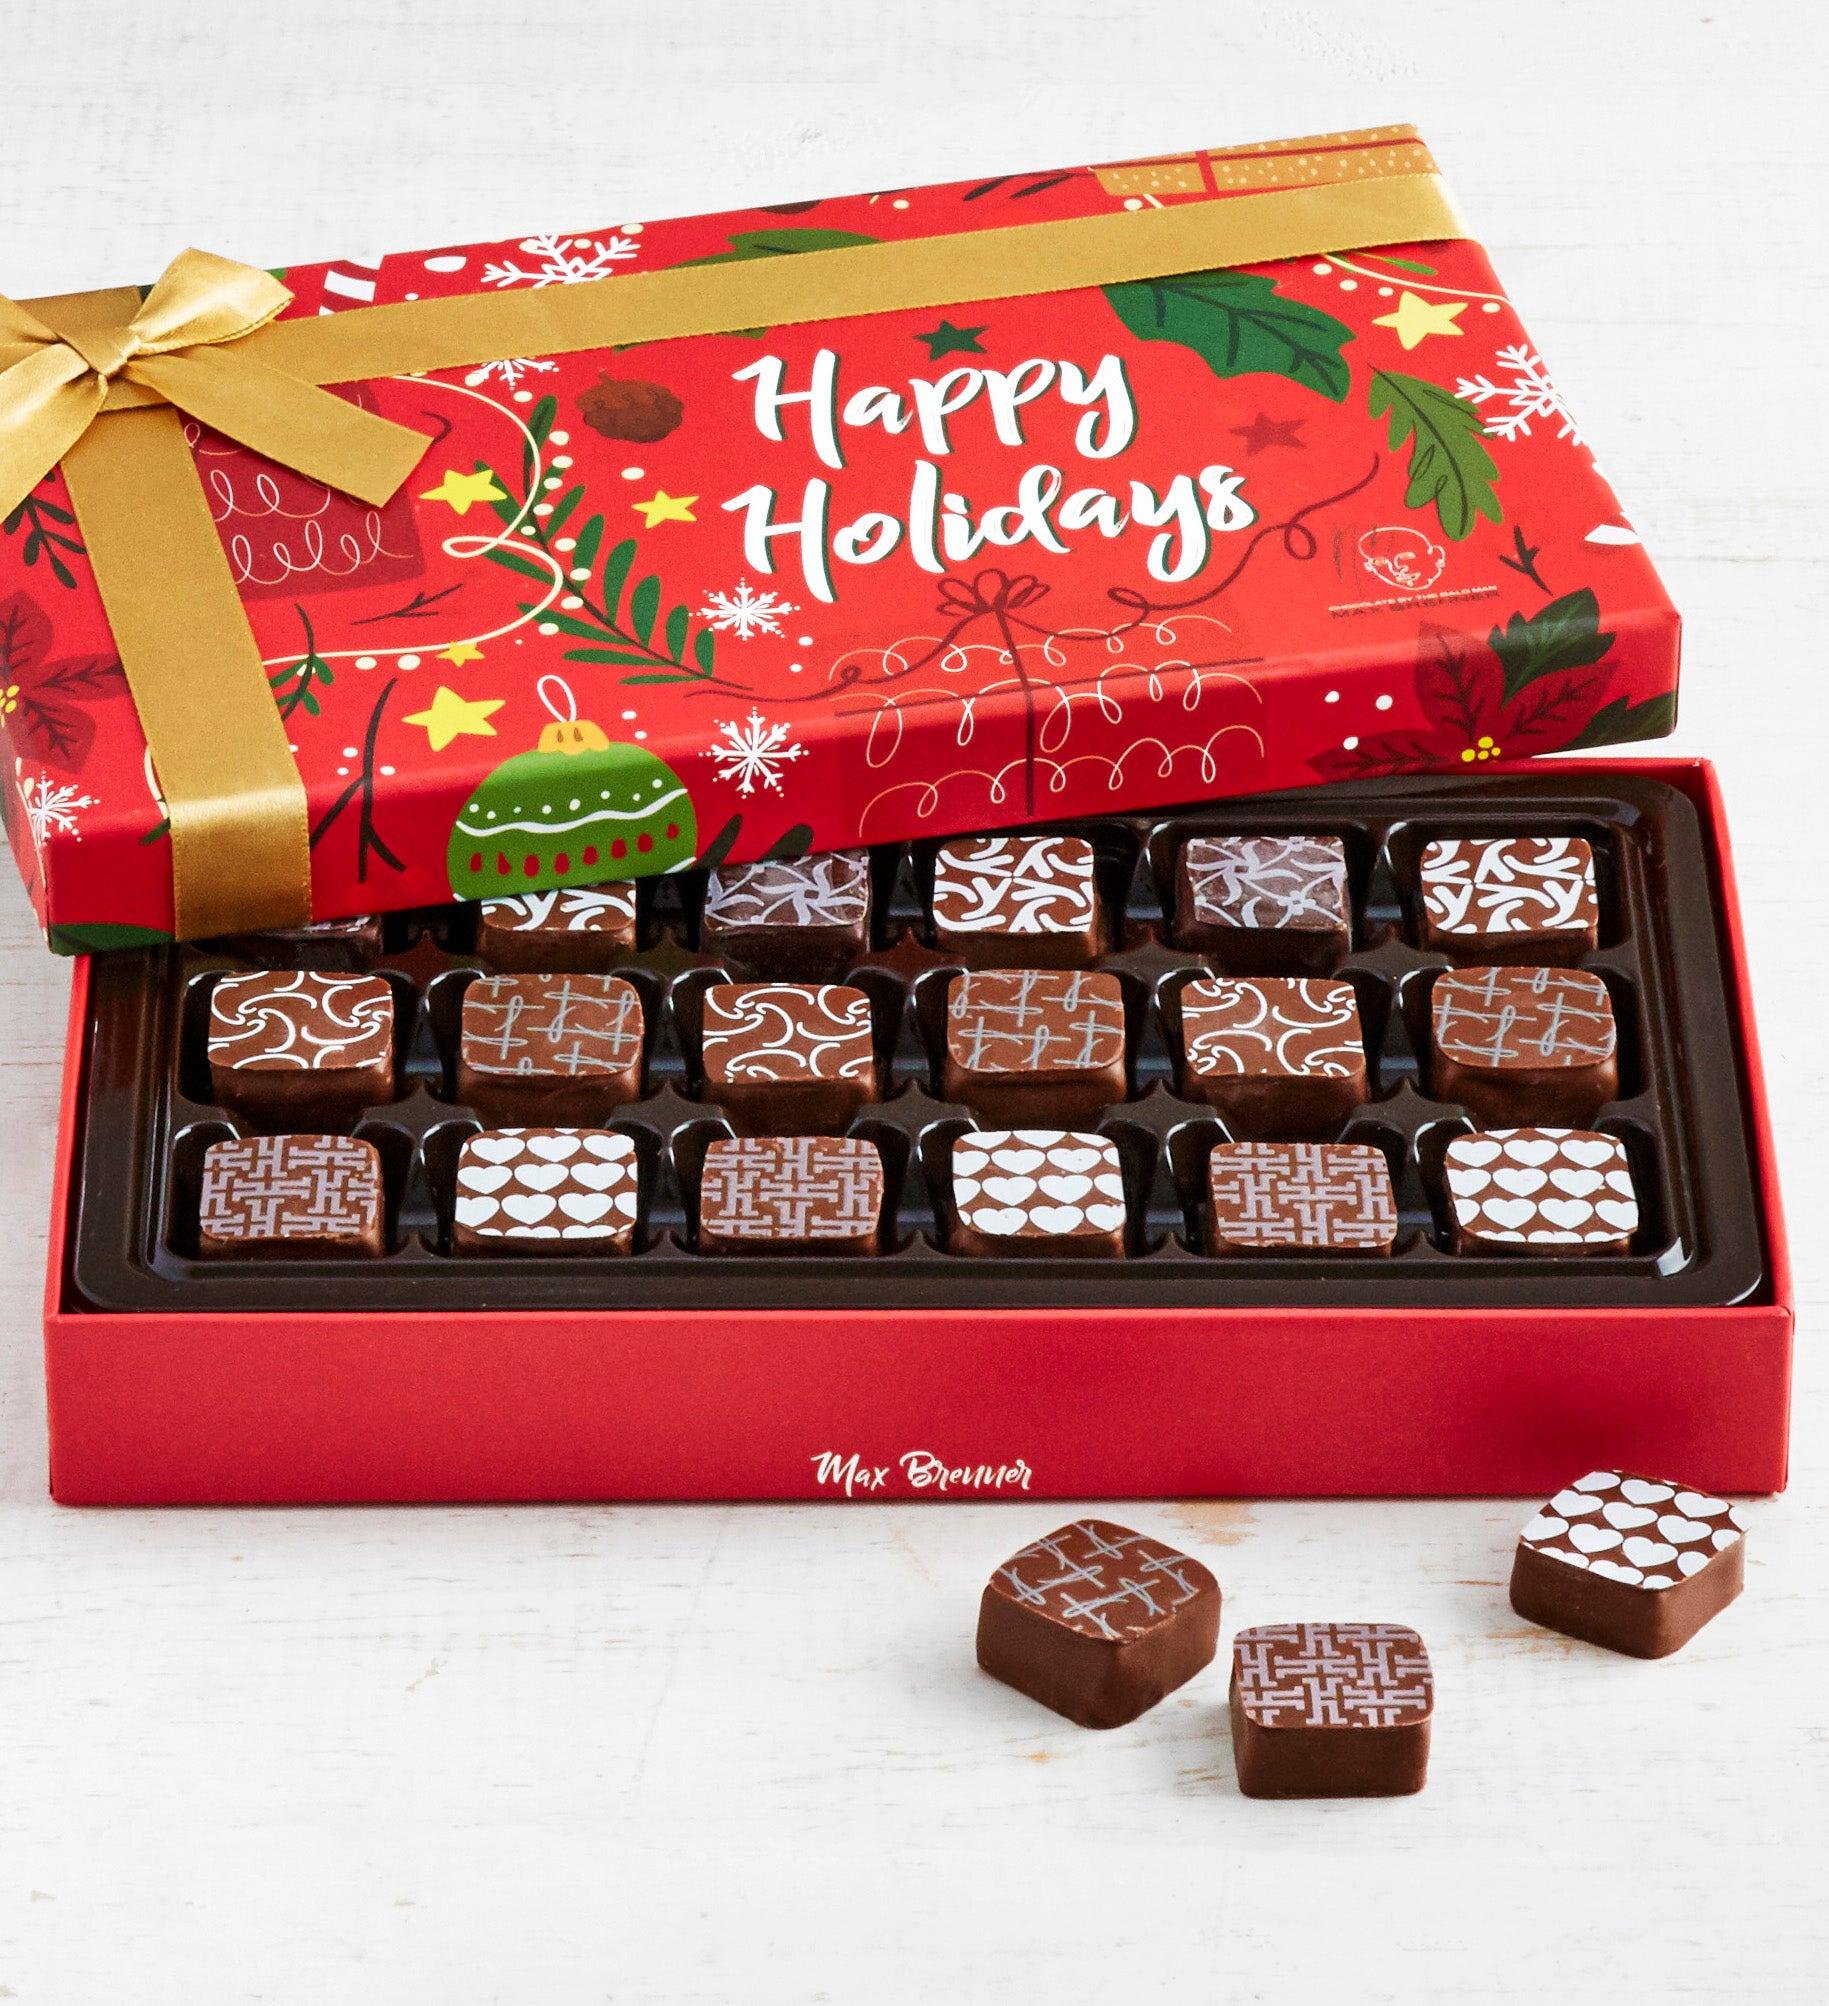 Max Brenner 18 Pc Holiday Chocolate Bon Bon Box